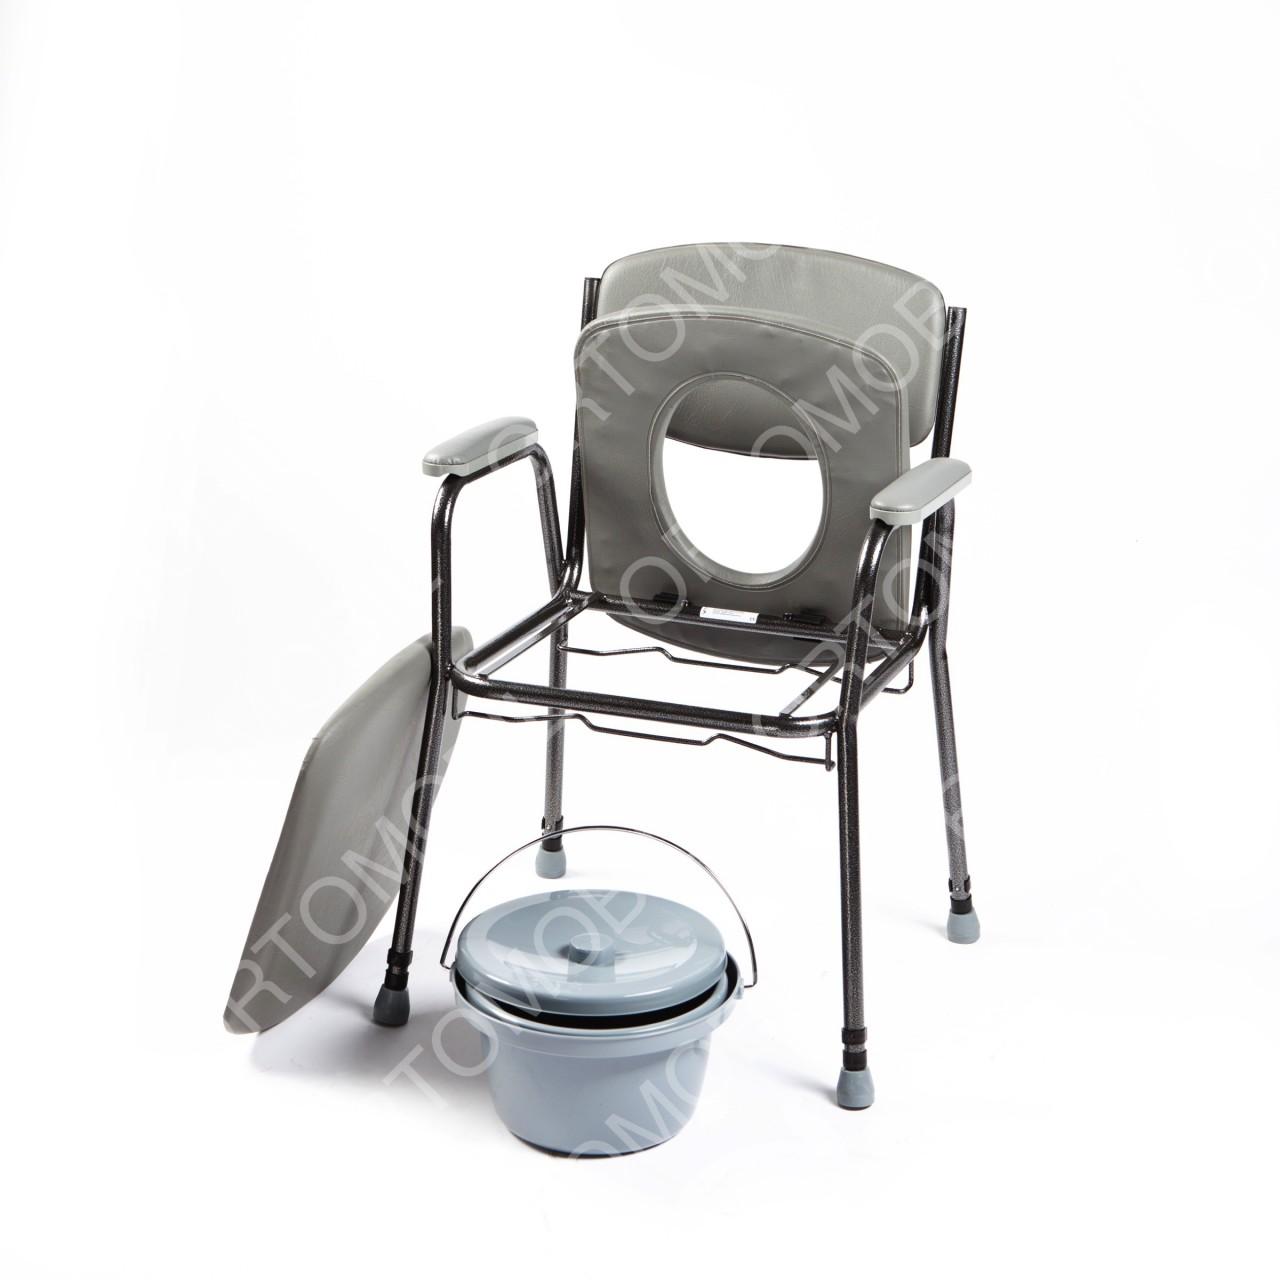 Scaun toaleta sezut moale, inaltime reglabila Ortomobil 047400